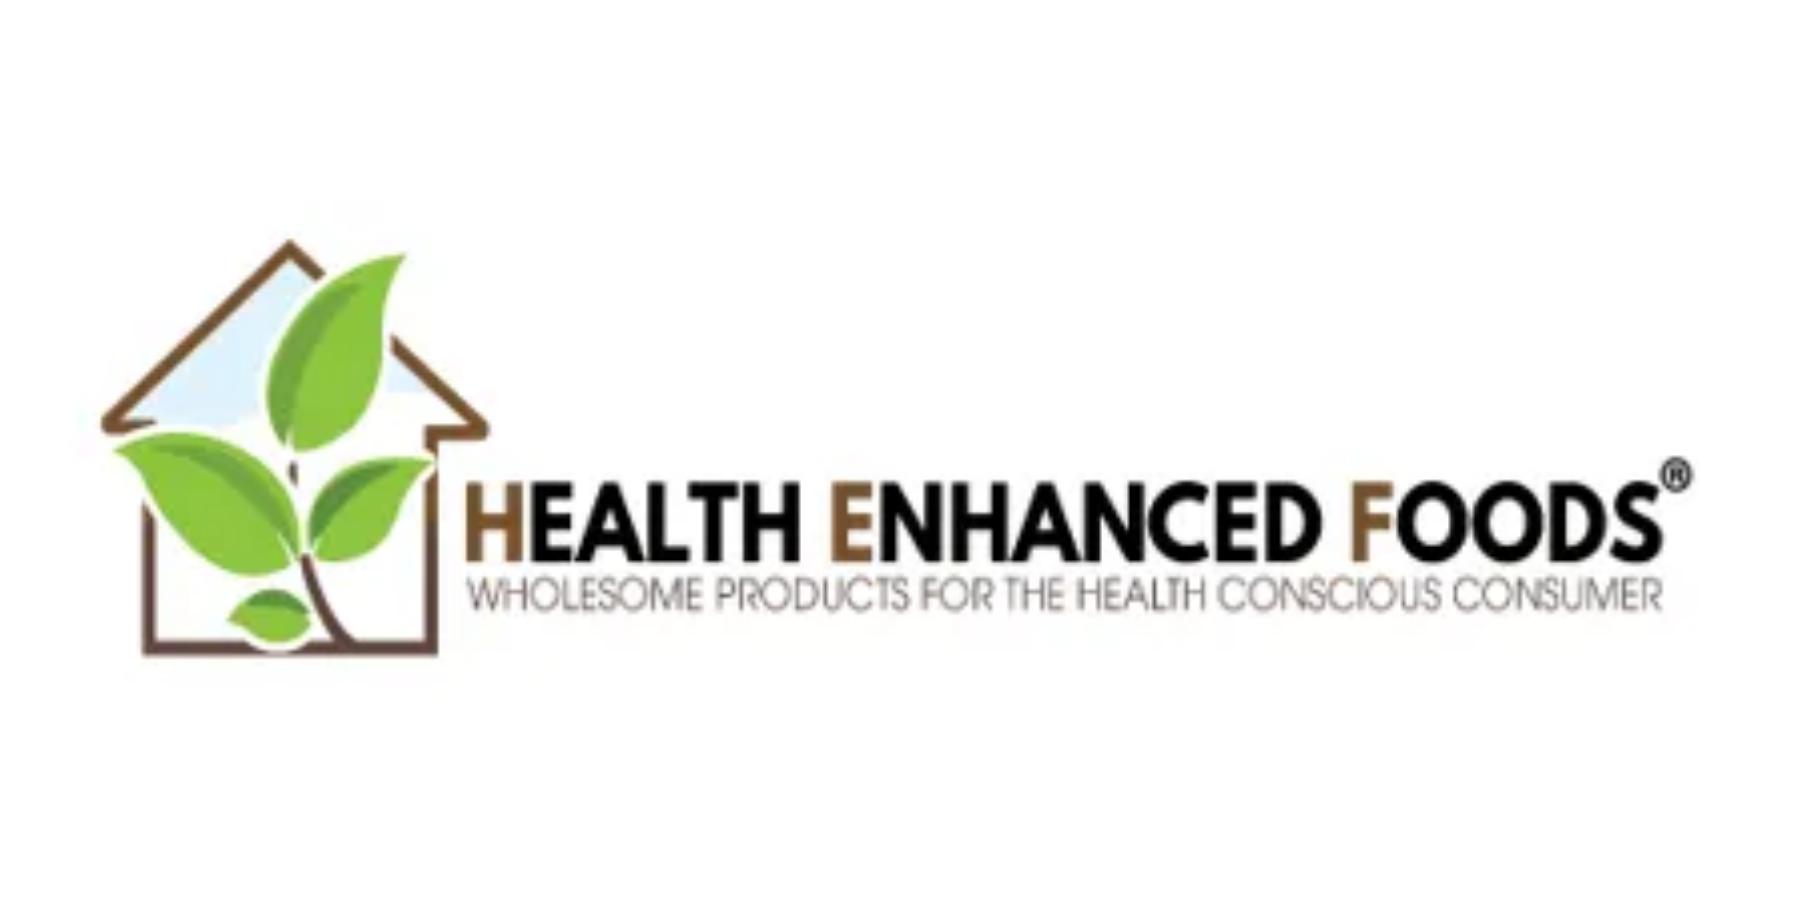 Health Enhanced Foods